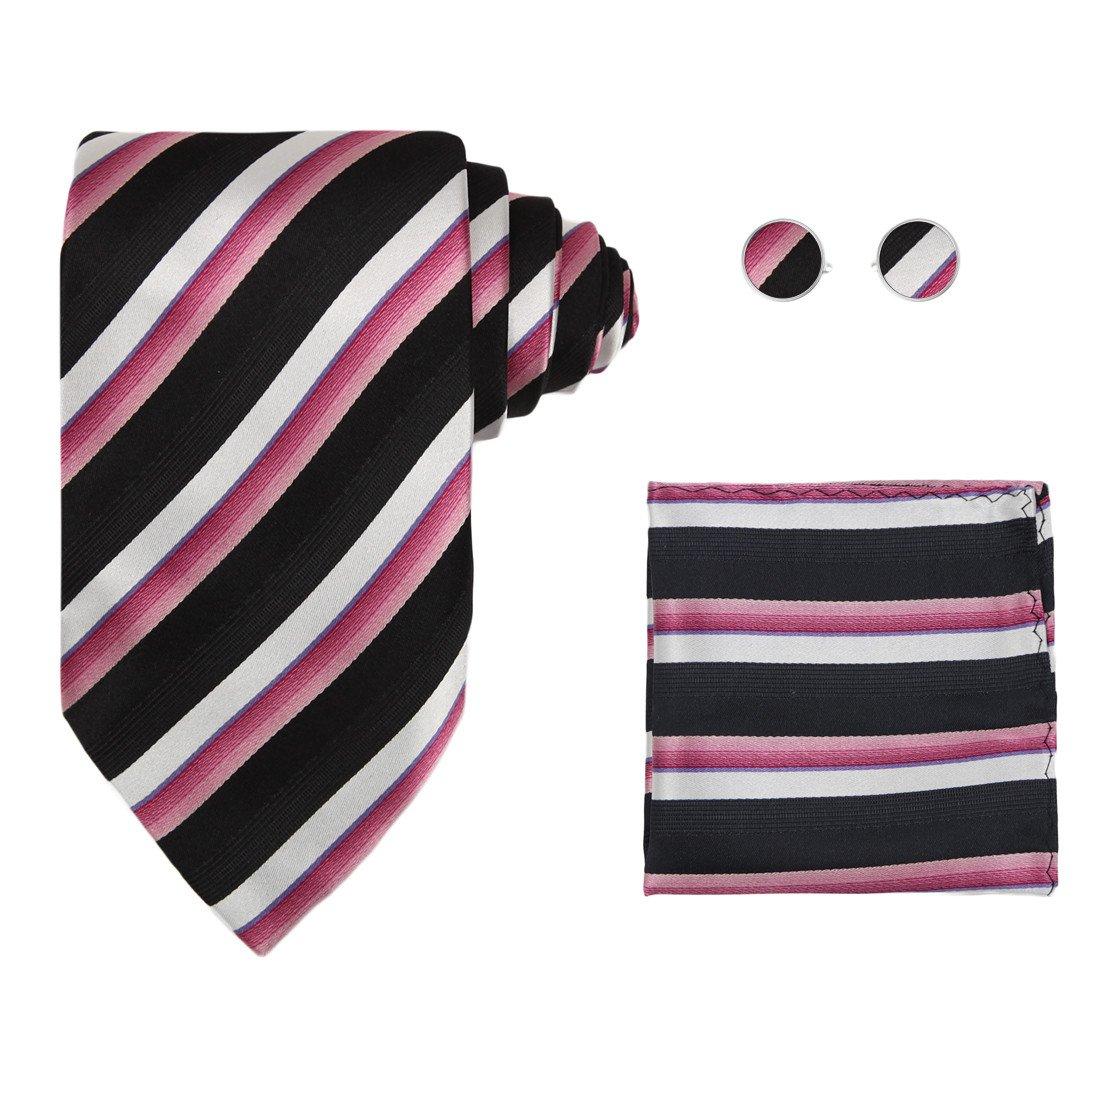 Hot pink stripes ties for men xmas gift mens style black silk ties cufflinks handkerchiefs set H5138  Hot Pink